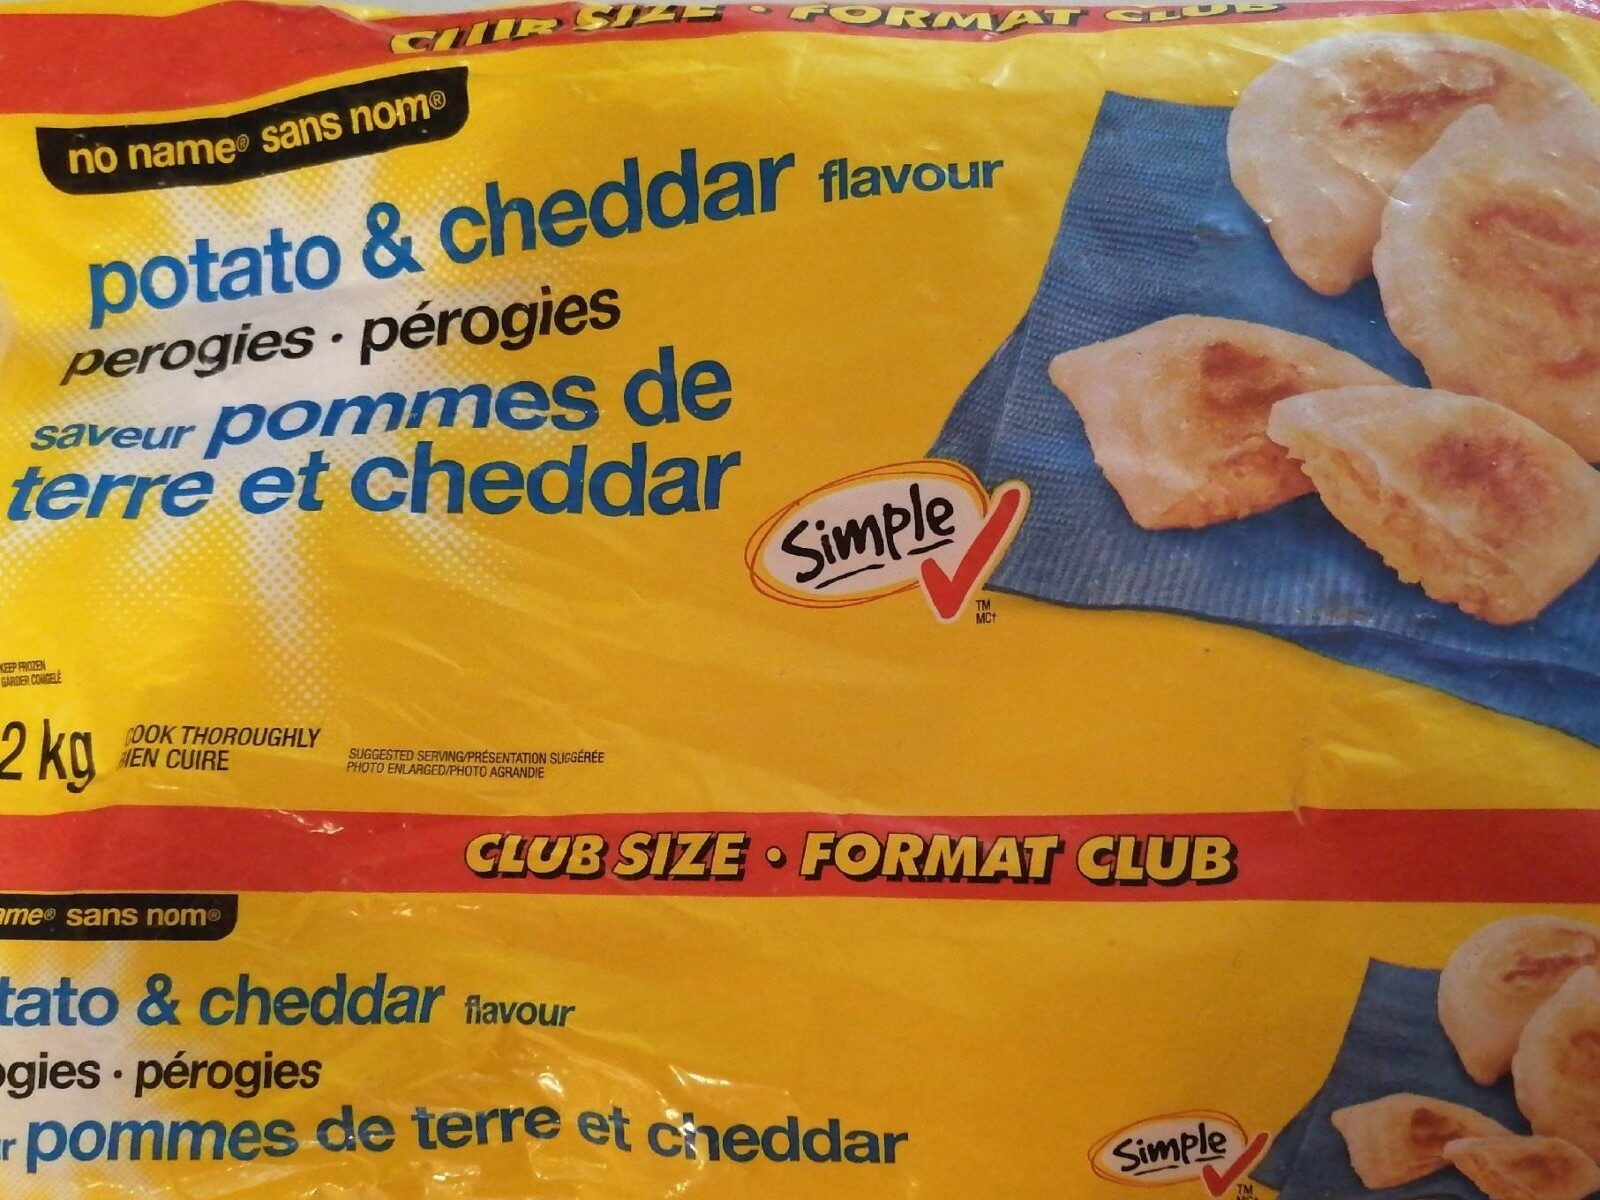 Pérogies saveur pomme de terre et cheedar - Product - fr